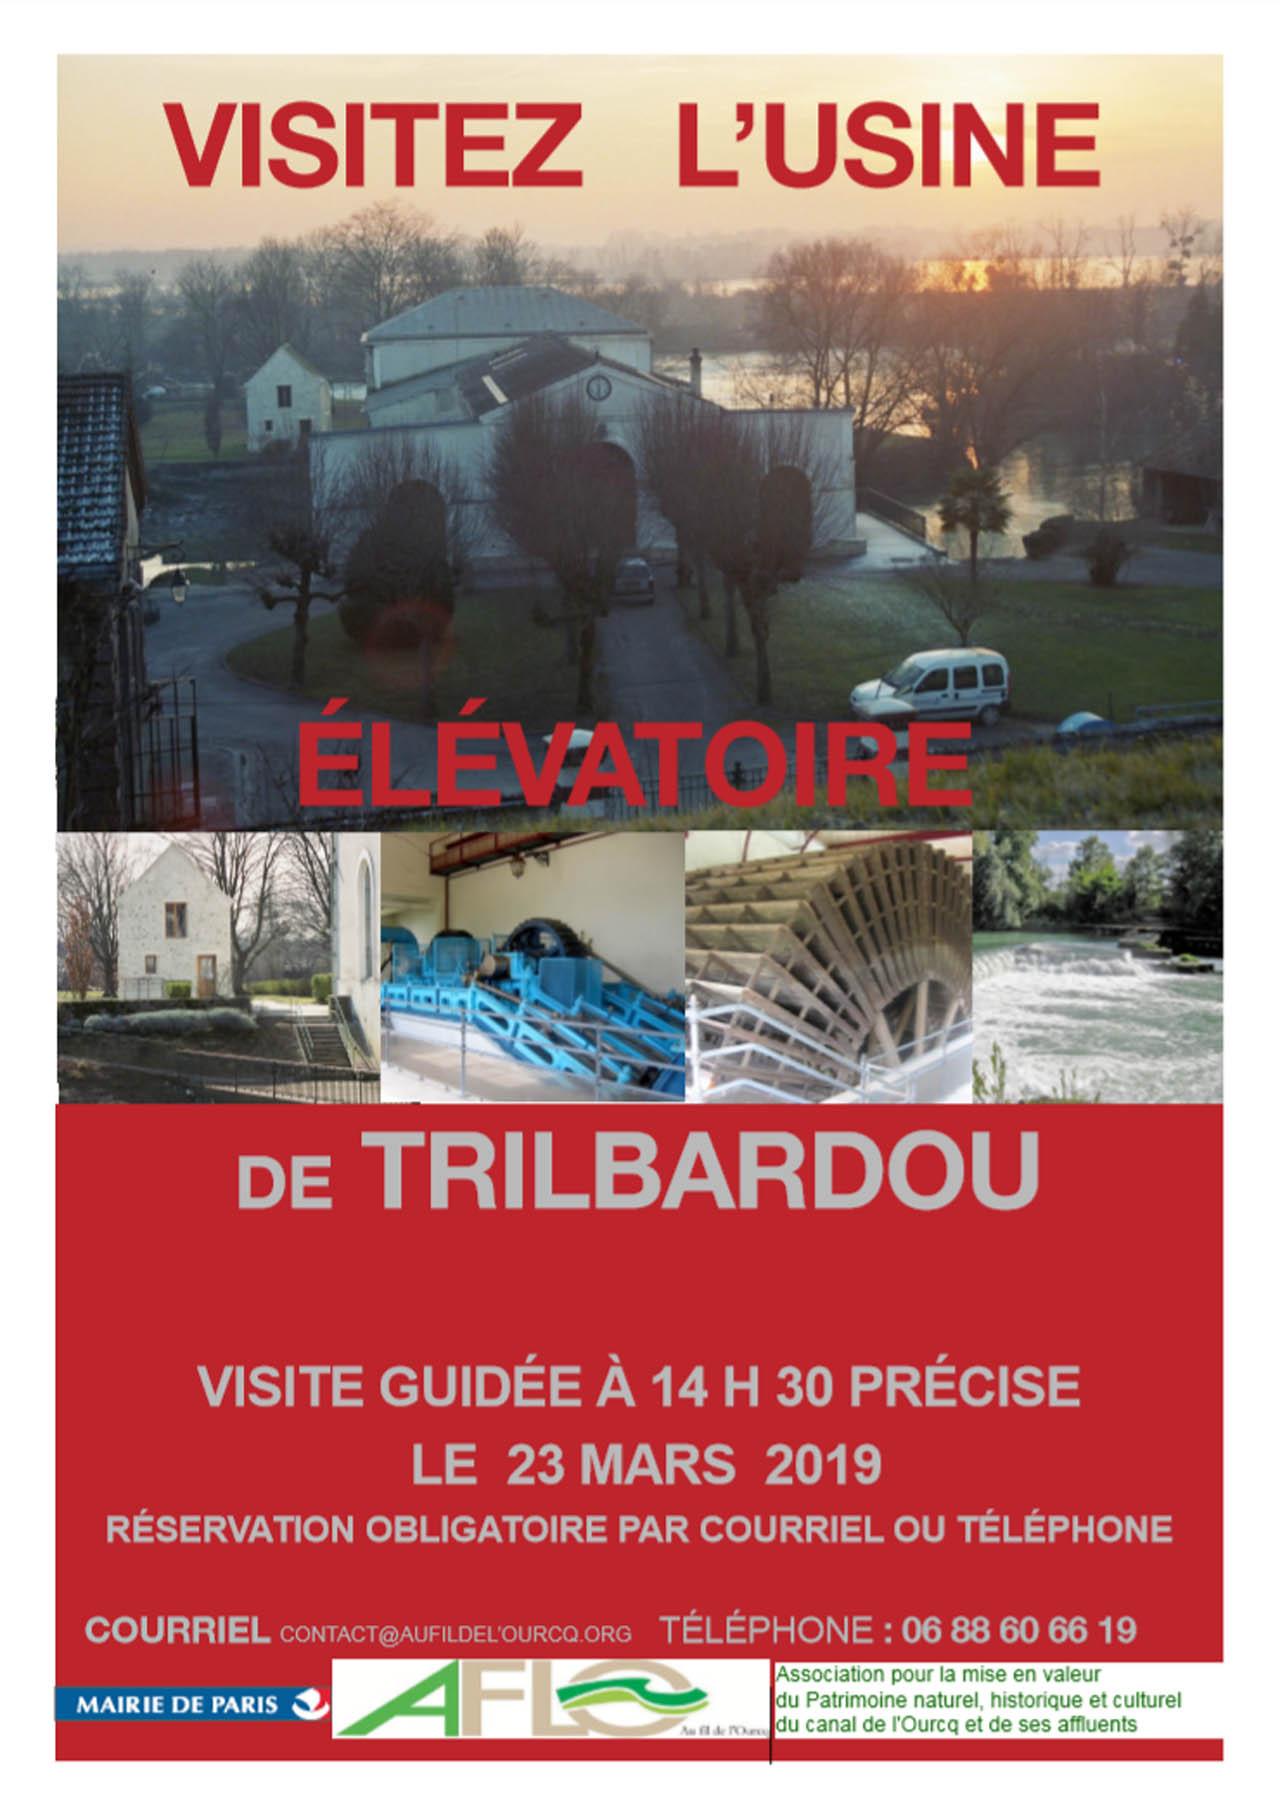 Visite de l'Usine Elevatrice de TRILBARDOU 23 mars 2019 Trilba10